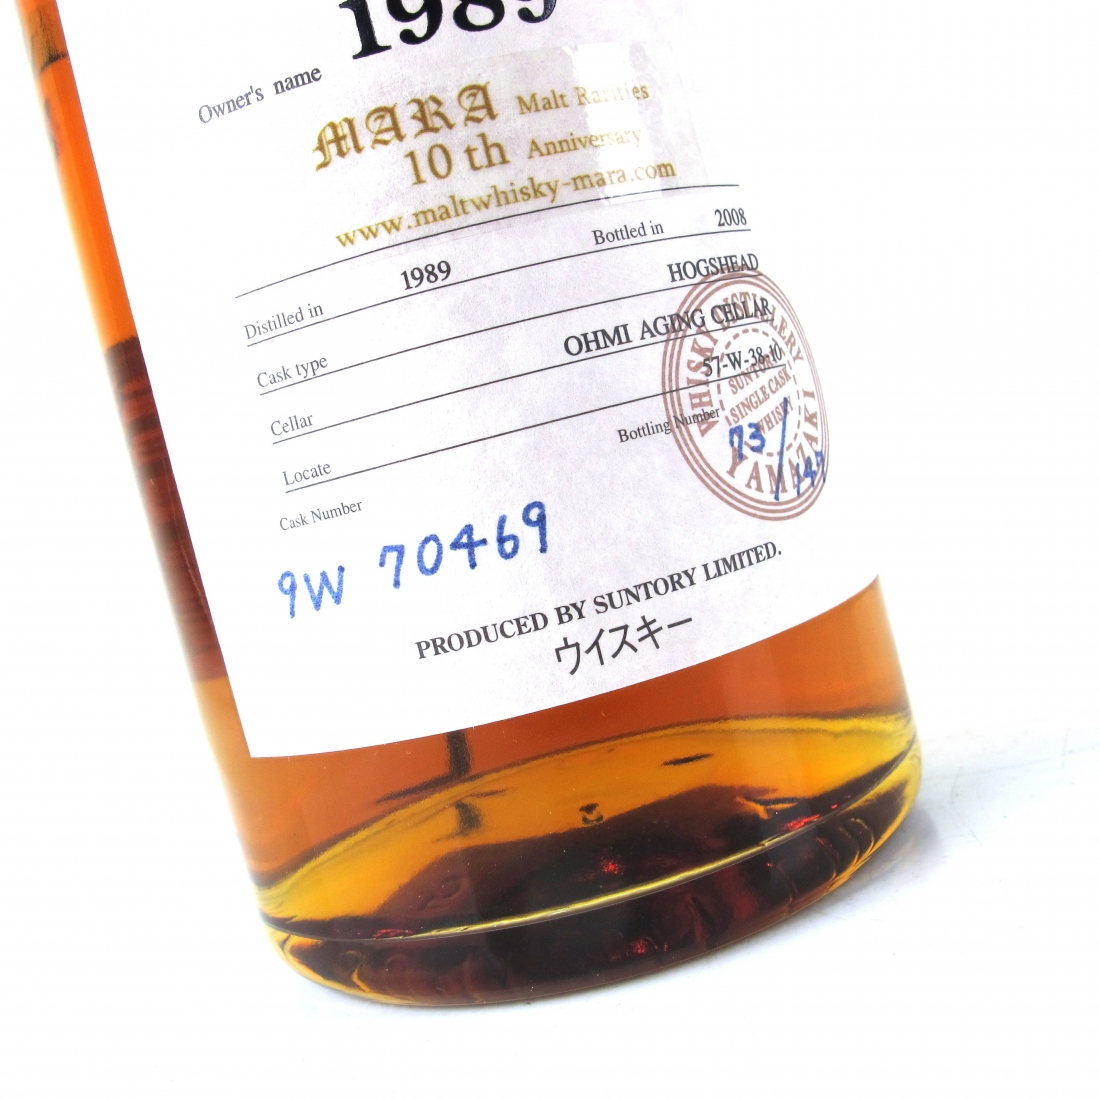 Yamazaki 1989 Single Cask #9W70469